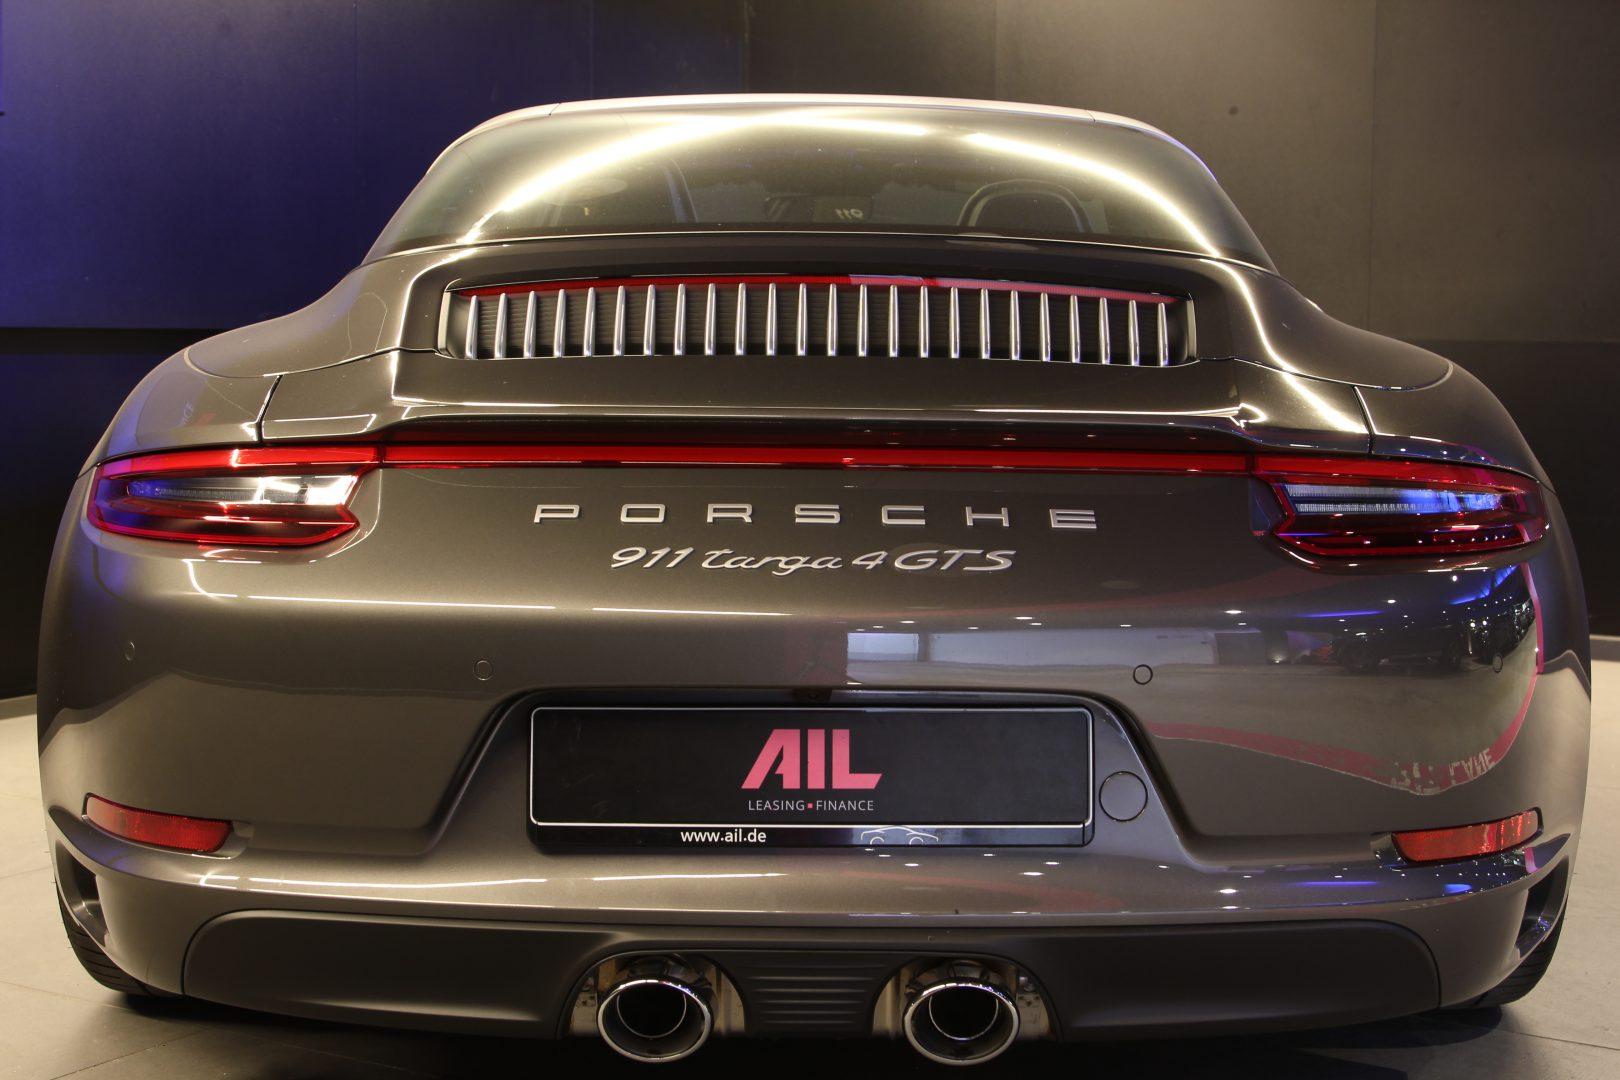 AIL Porsche 991 Targa 4 GTS Exclusiv 3